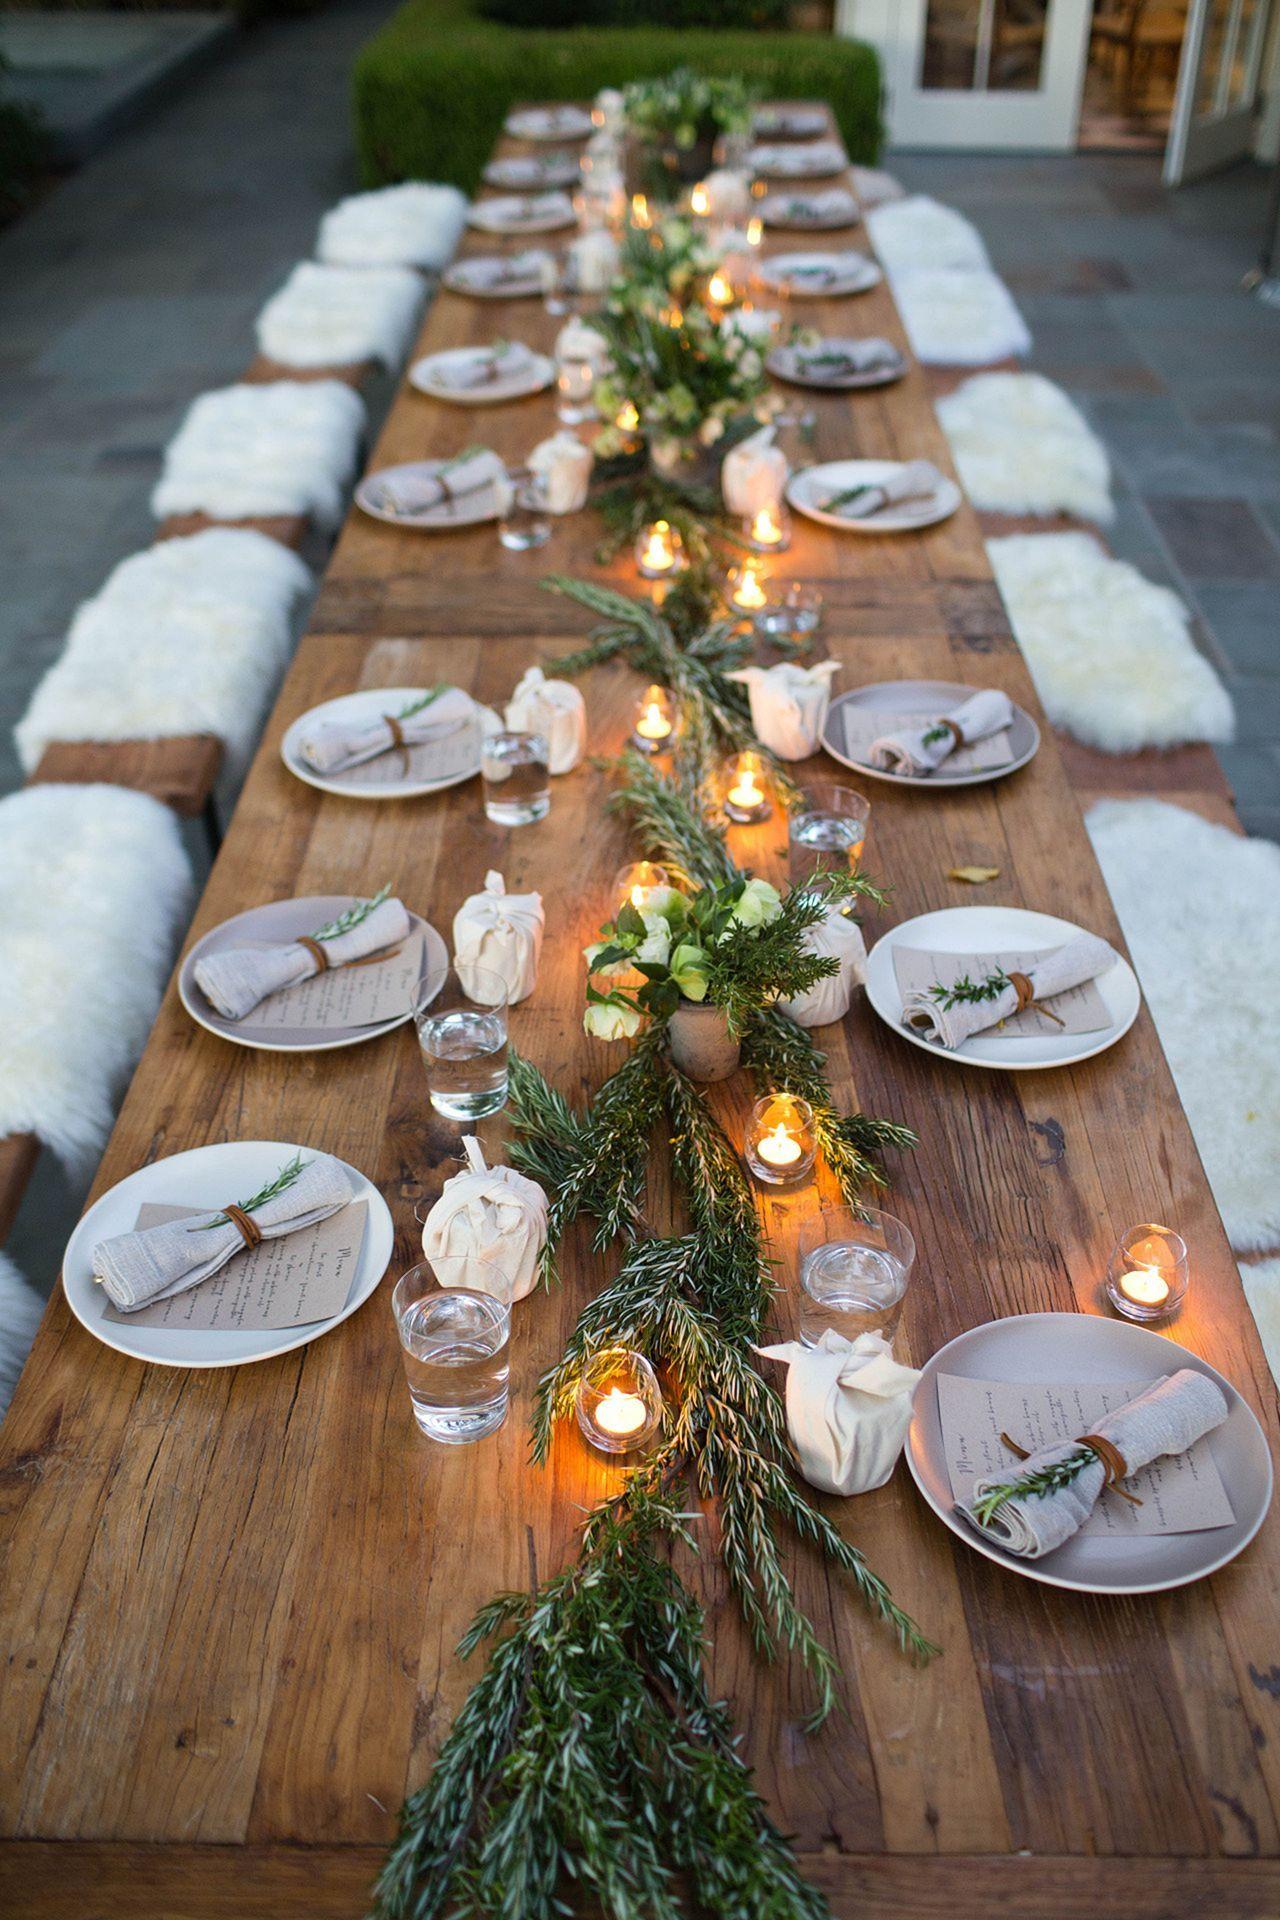 Top 5 Rustic Backyard Wedding Party Decor Ideas Rustic Wedding Table Wedding Table Christmas Table Settings